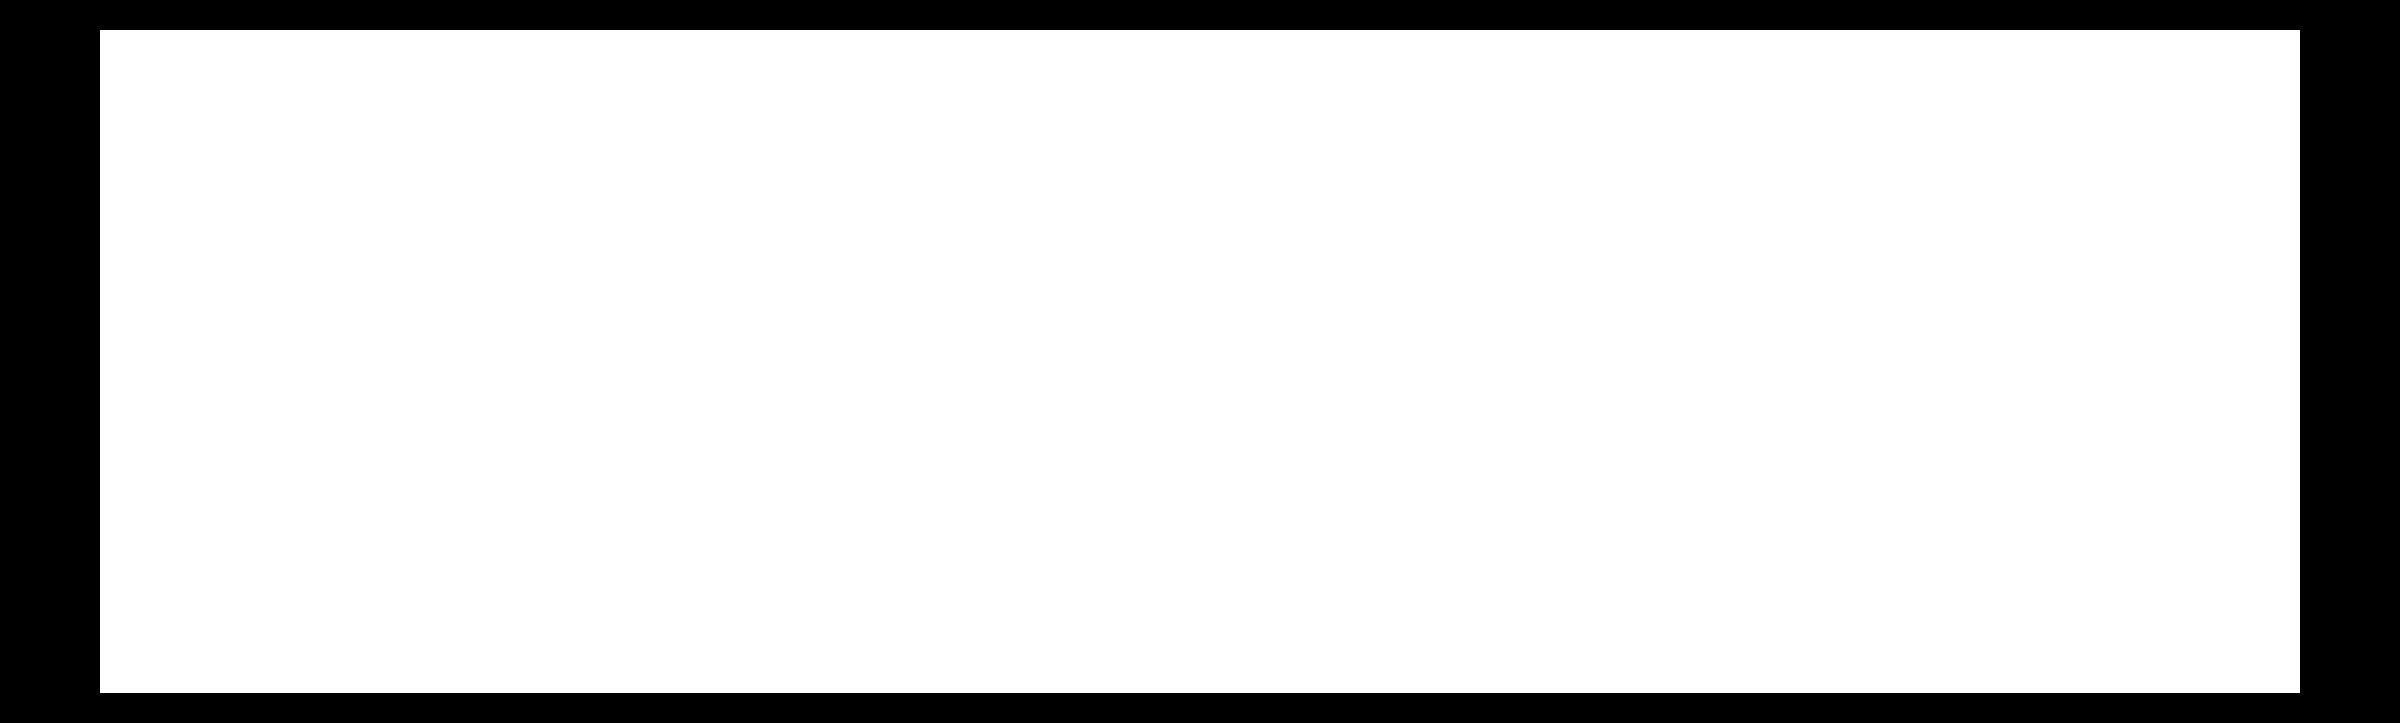 Amazon logo white png Free Download.